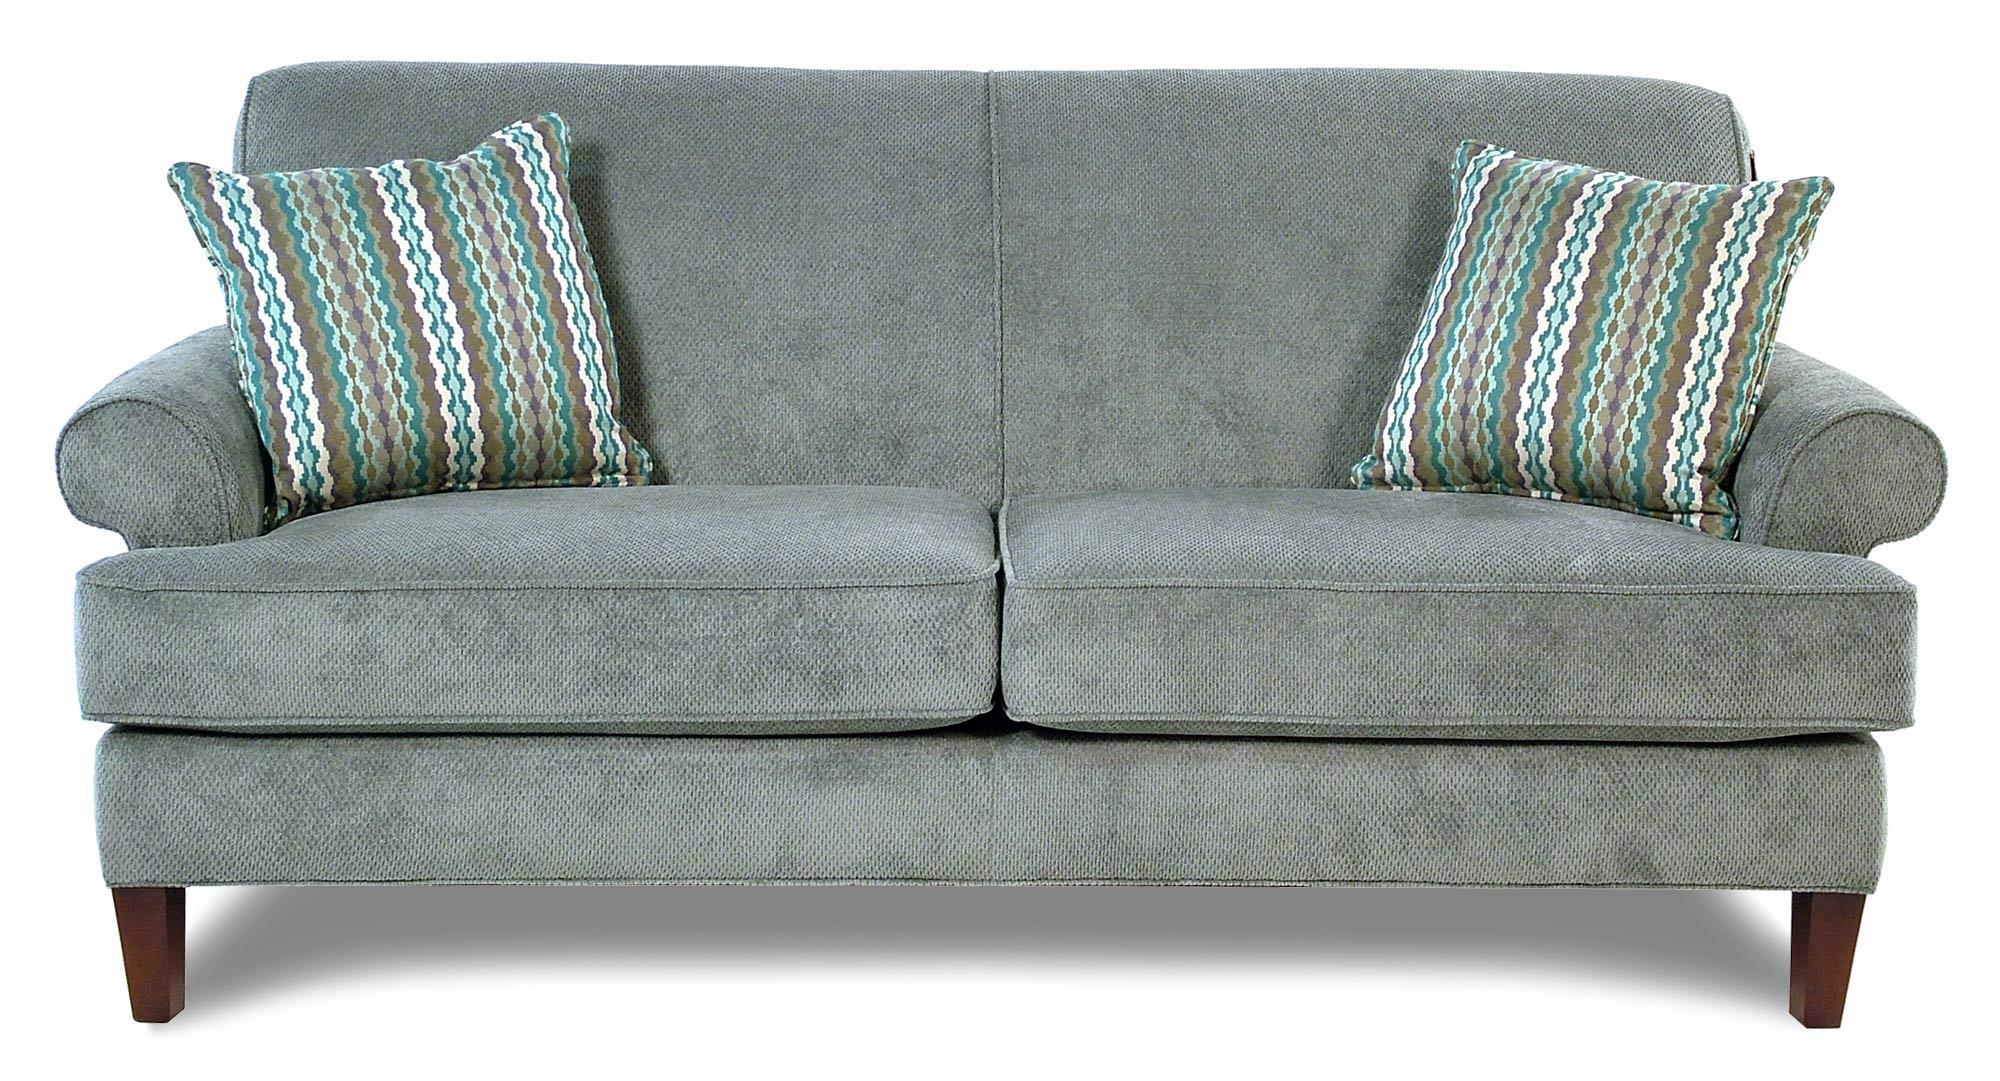 Broyhill Furniture Amanda  Transitional Sofa w/ Tapered Wood Legs - Item Number: 4252-3VIP-4255-32